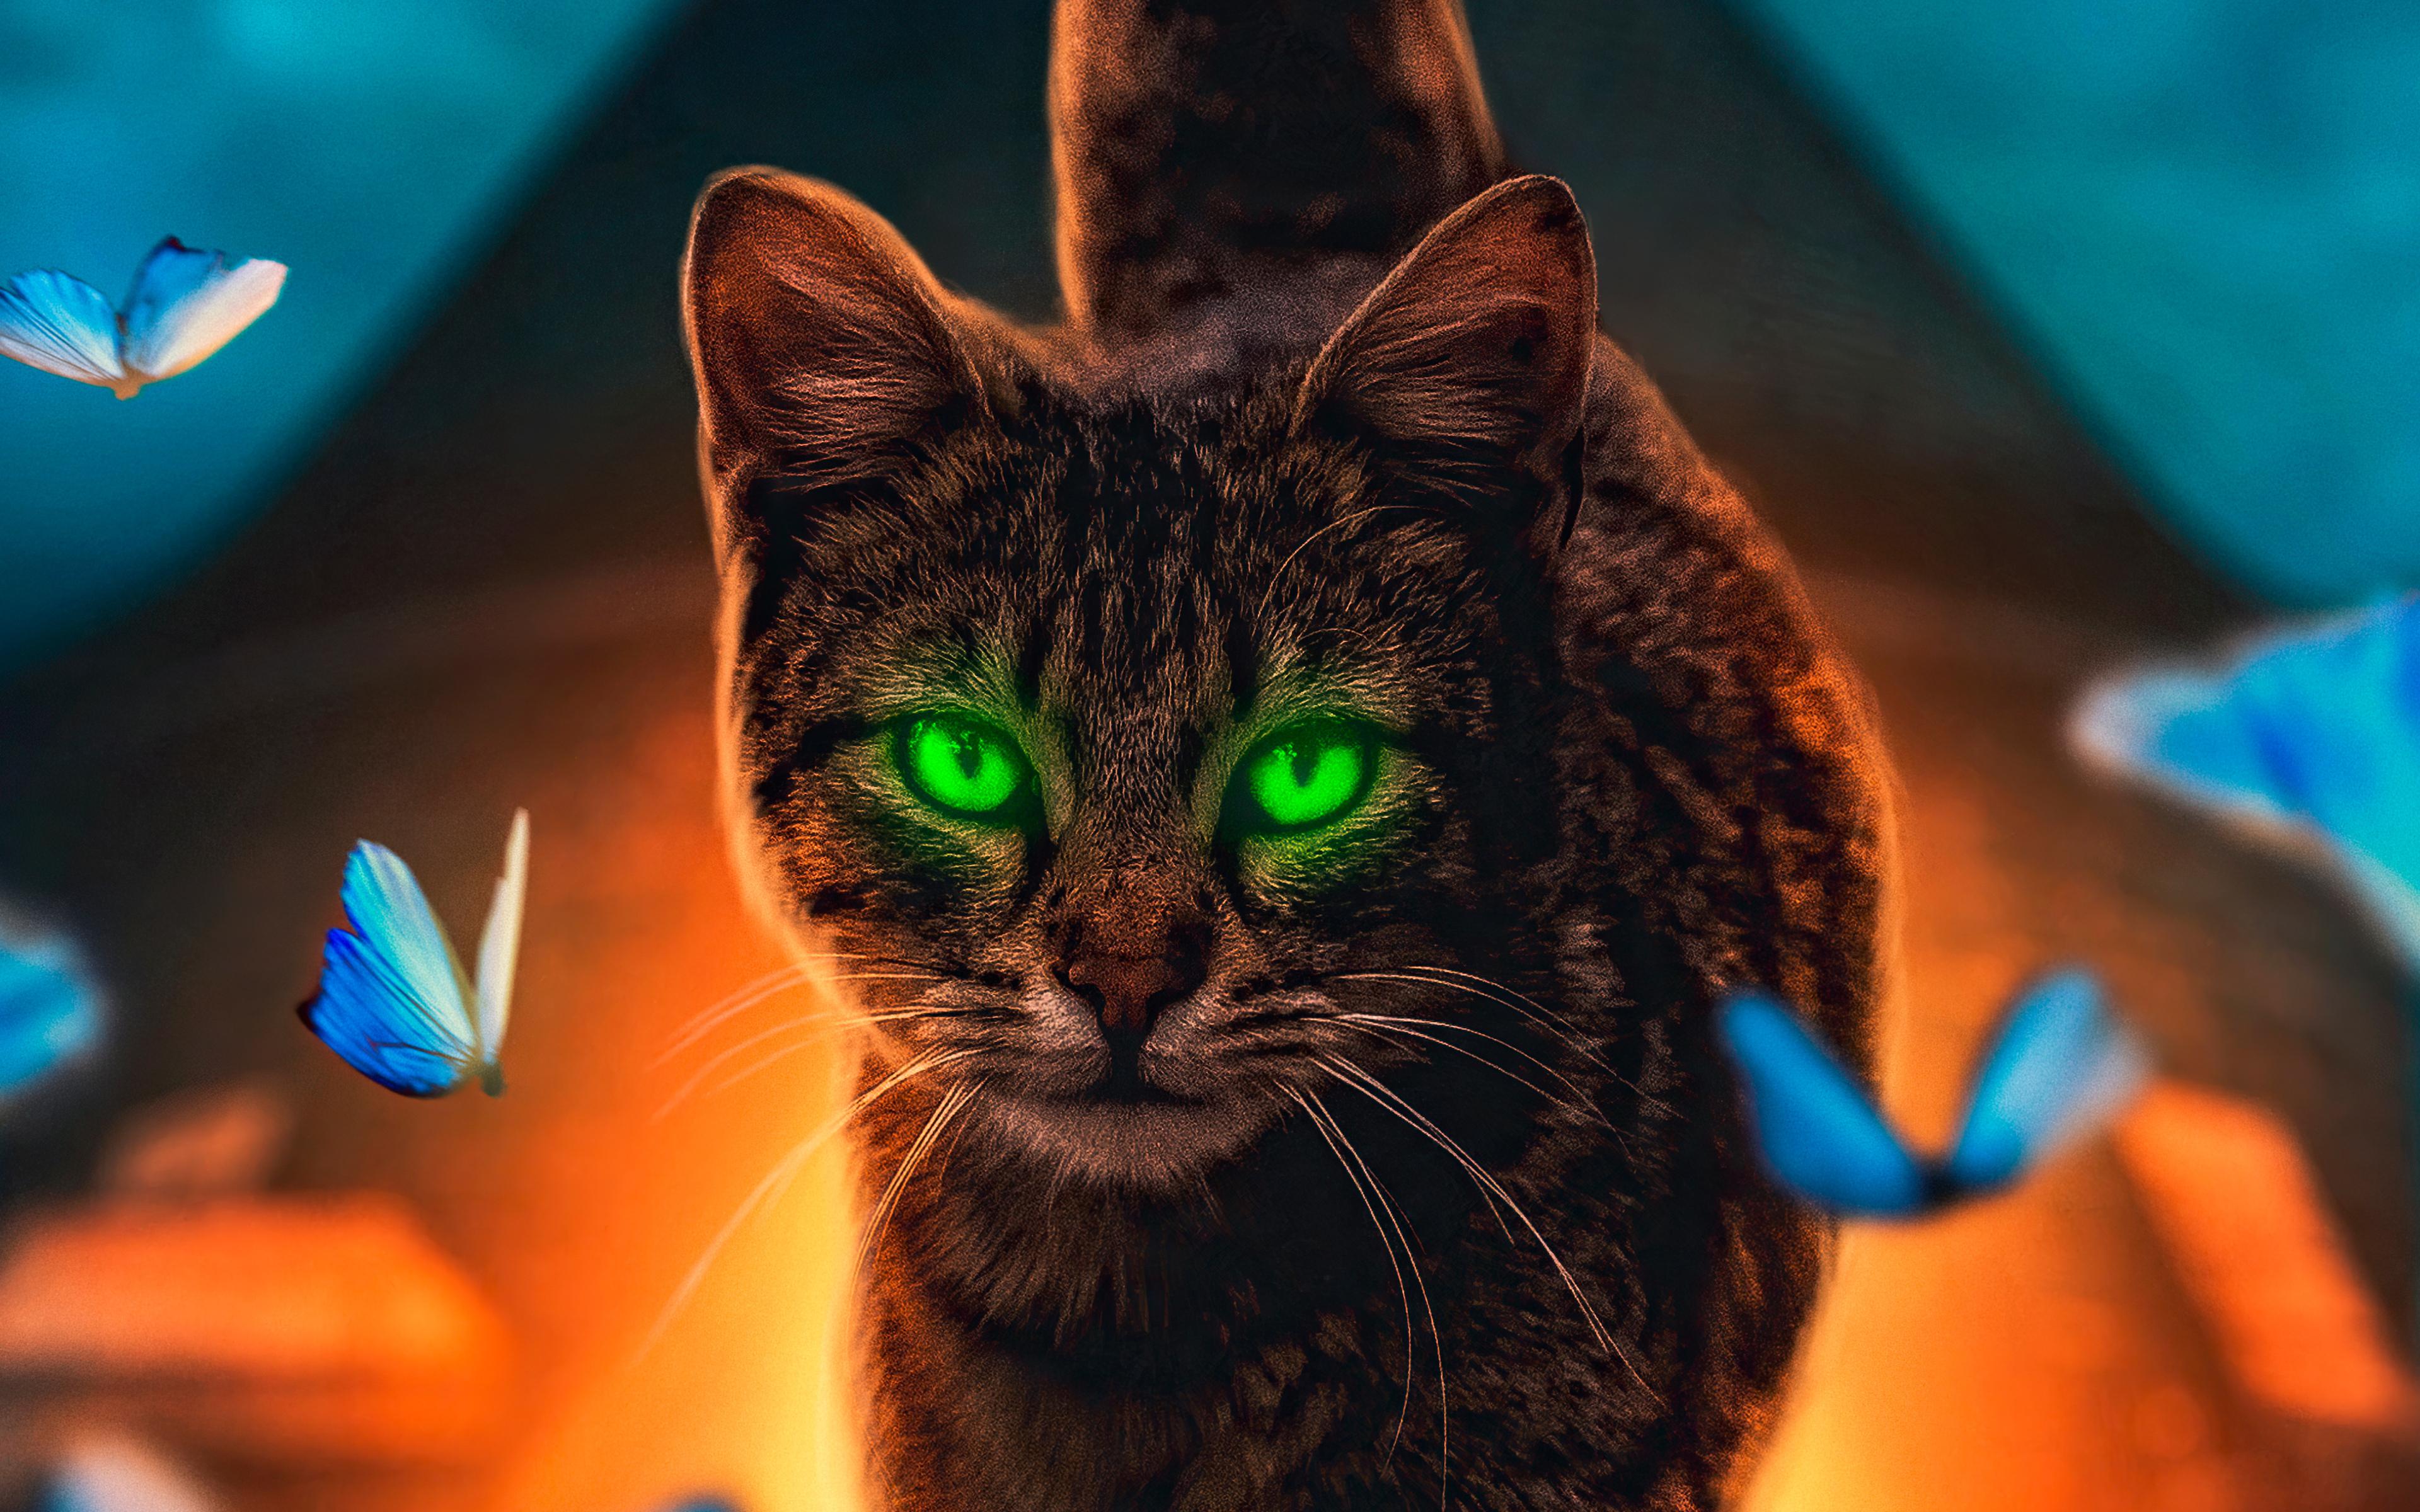 cat-magical-walk-4k-s9.jpg